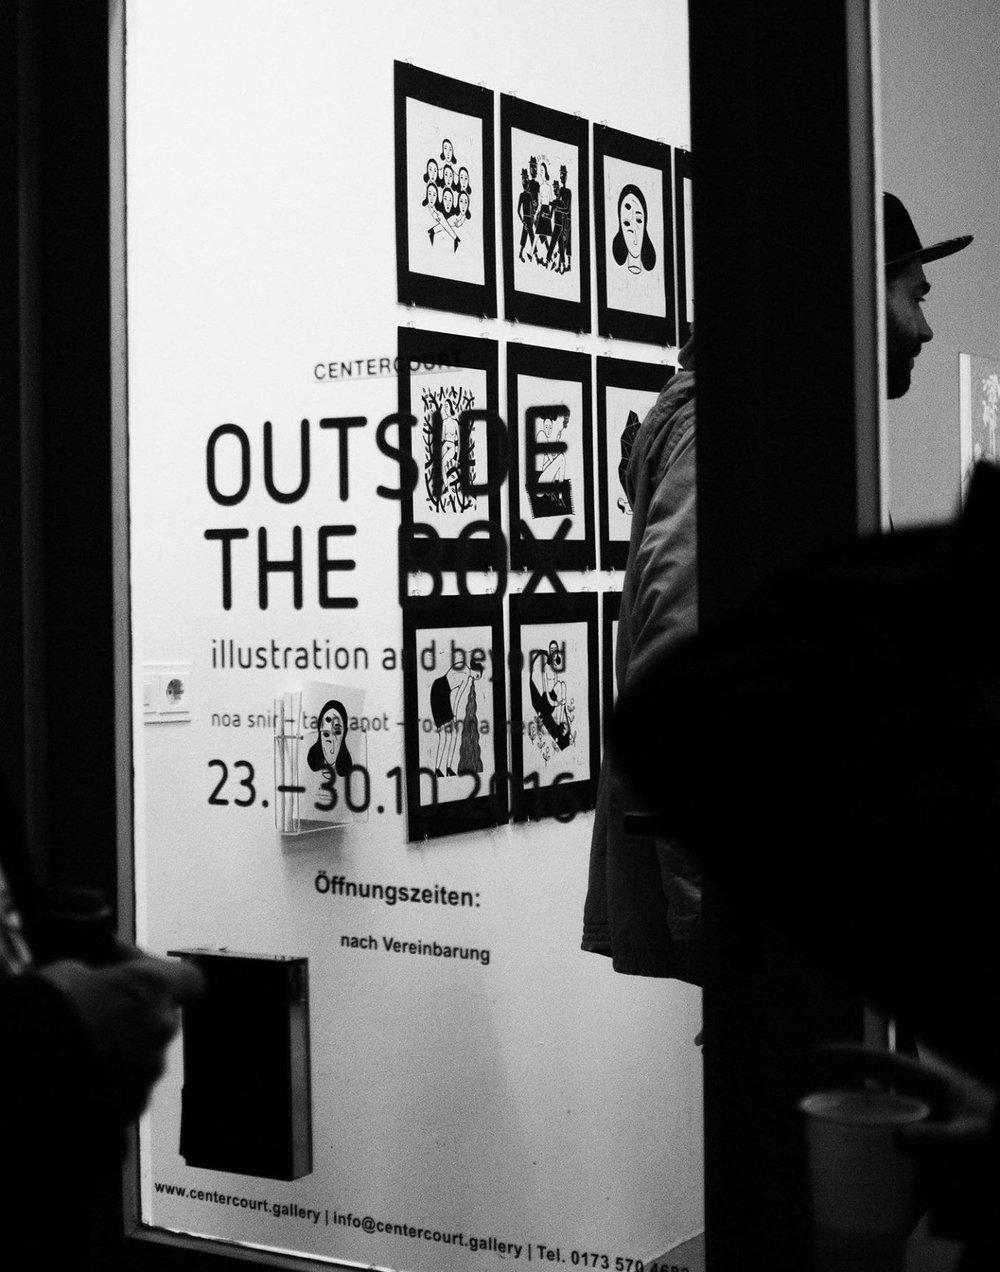 - »OUTSIDE THE BOX – Illustration and beyond«Tal Granot, Rosanna Merklin und Noa Snir22.10.–11.11.2016super+CENTERCOURTAdalbertstraße 44, 80799 München